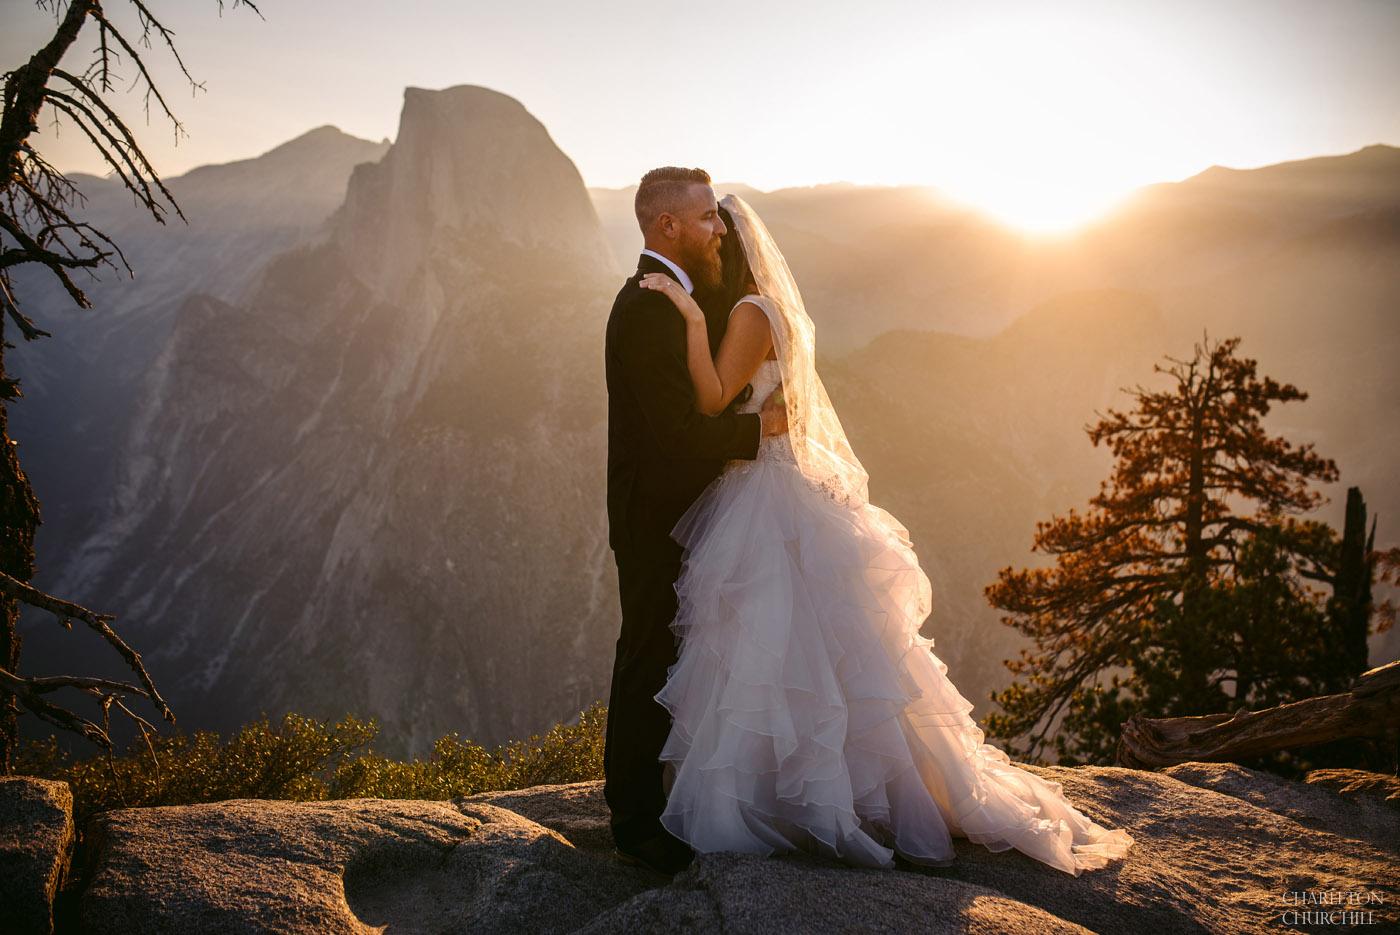 epic wedding photography at yosemite glacier point